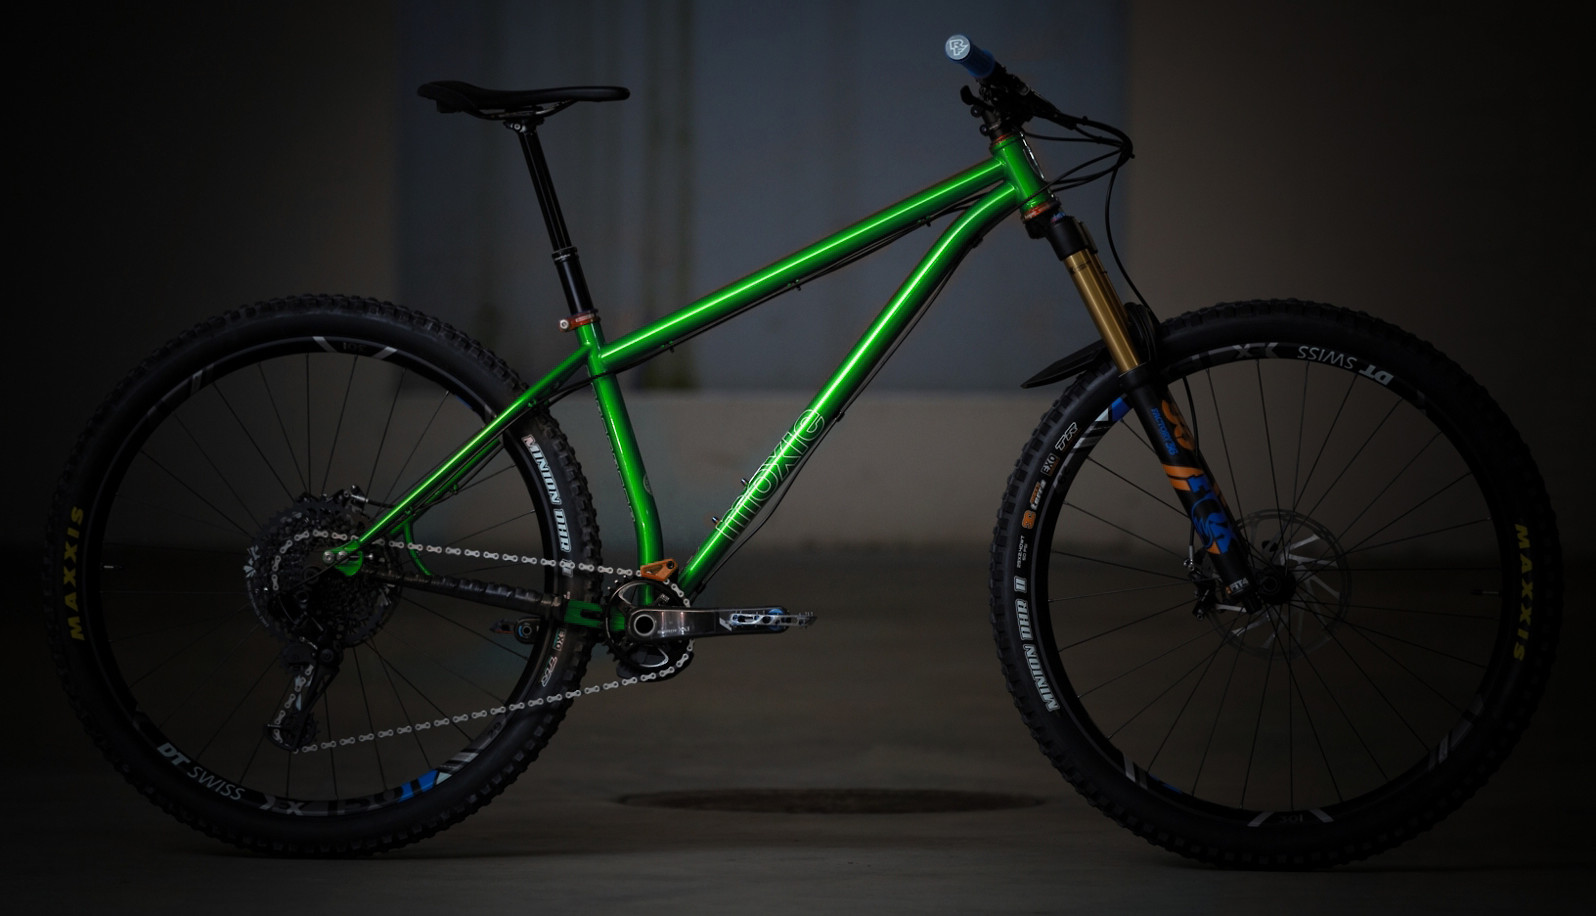 2020 Pipedream Moxie MX3 (Vivid Emerald, custom build shown)